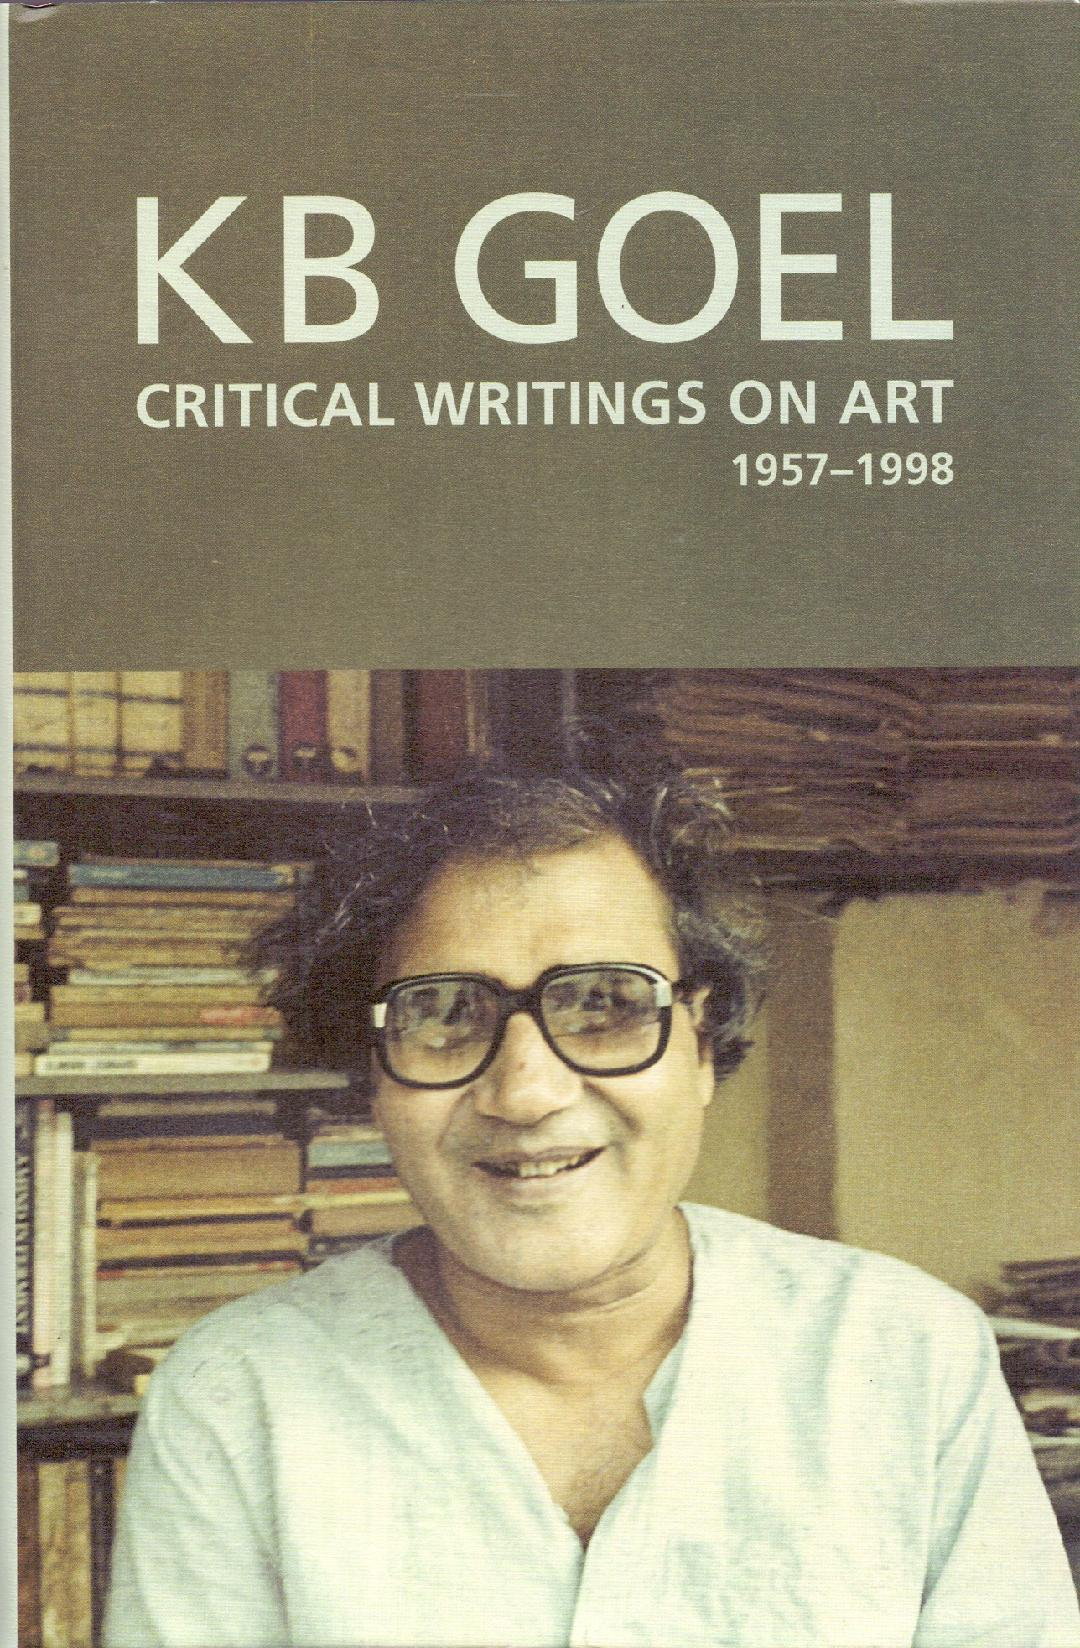 K B Goel: Critical Writings on Art 1957-1998